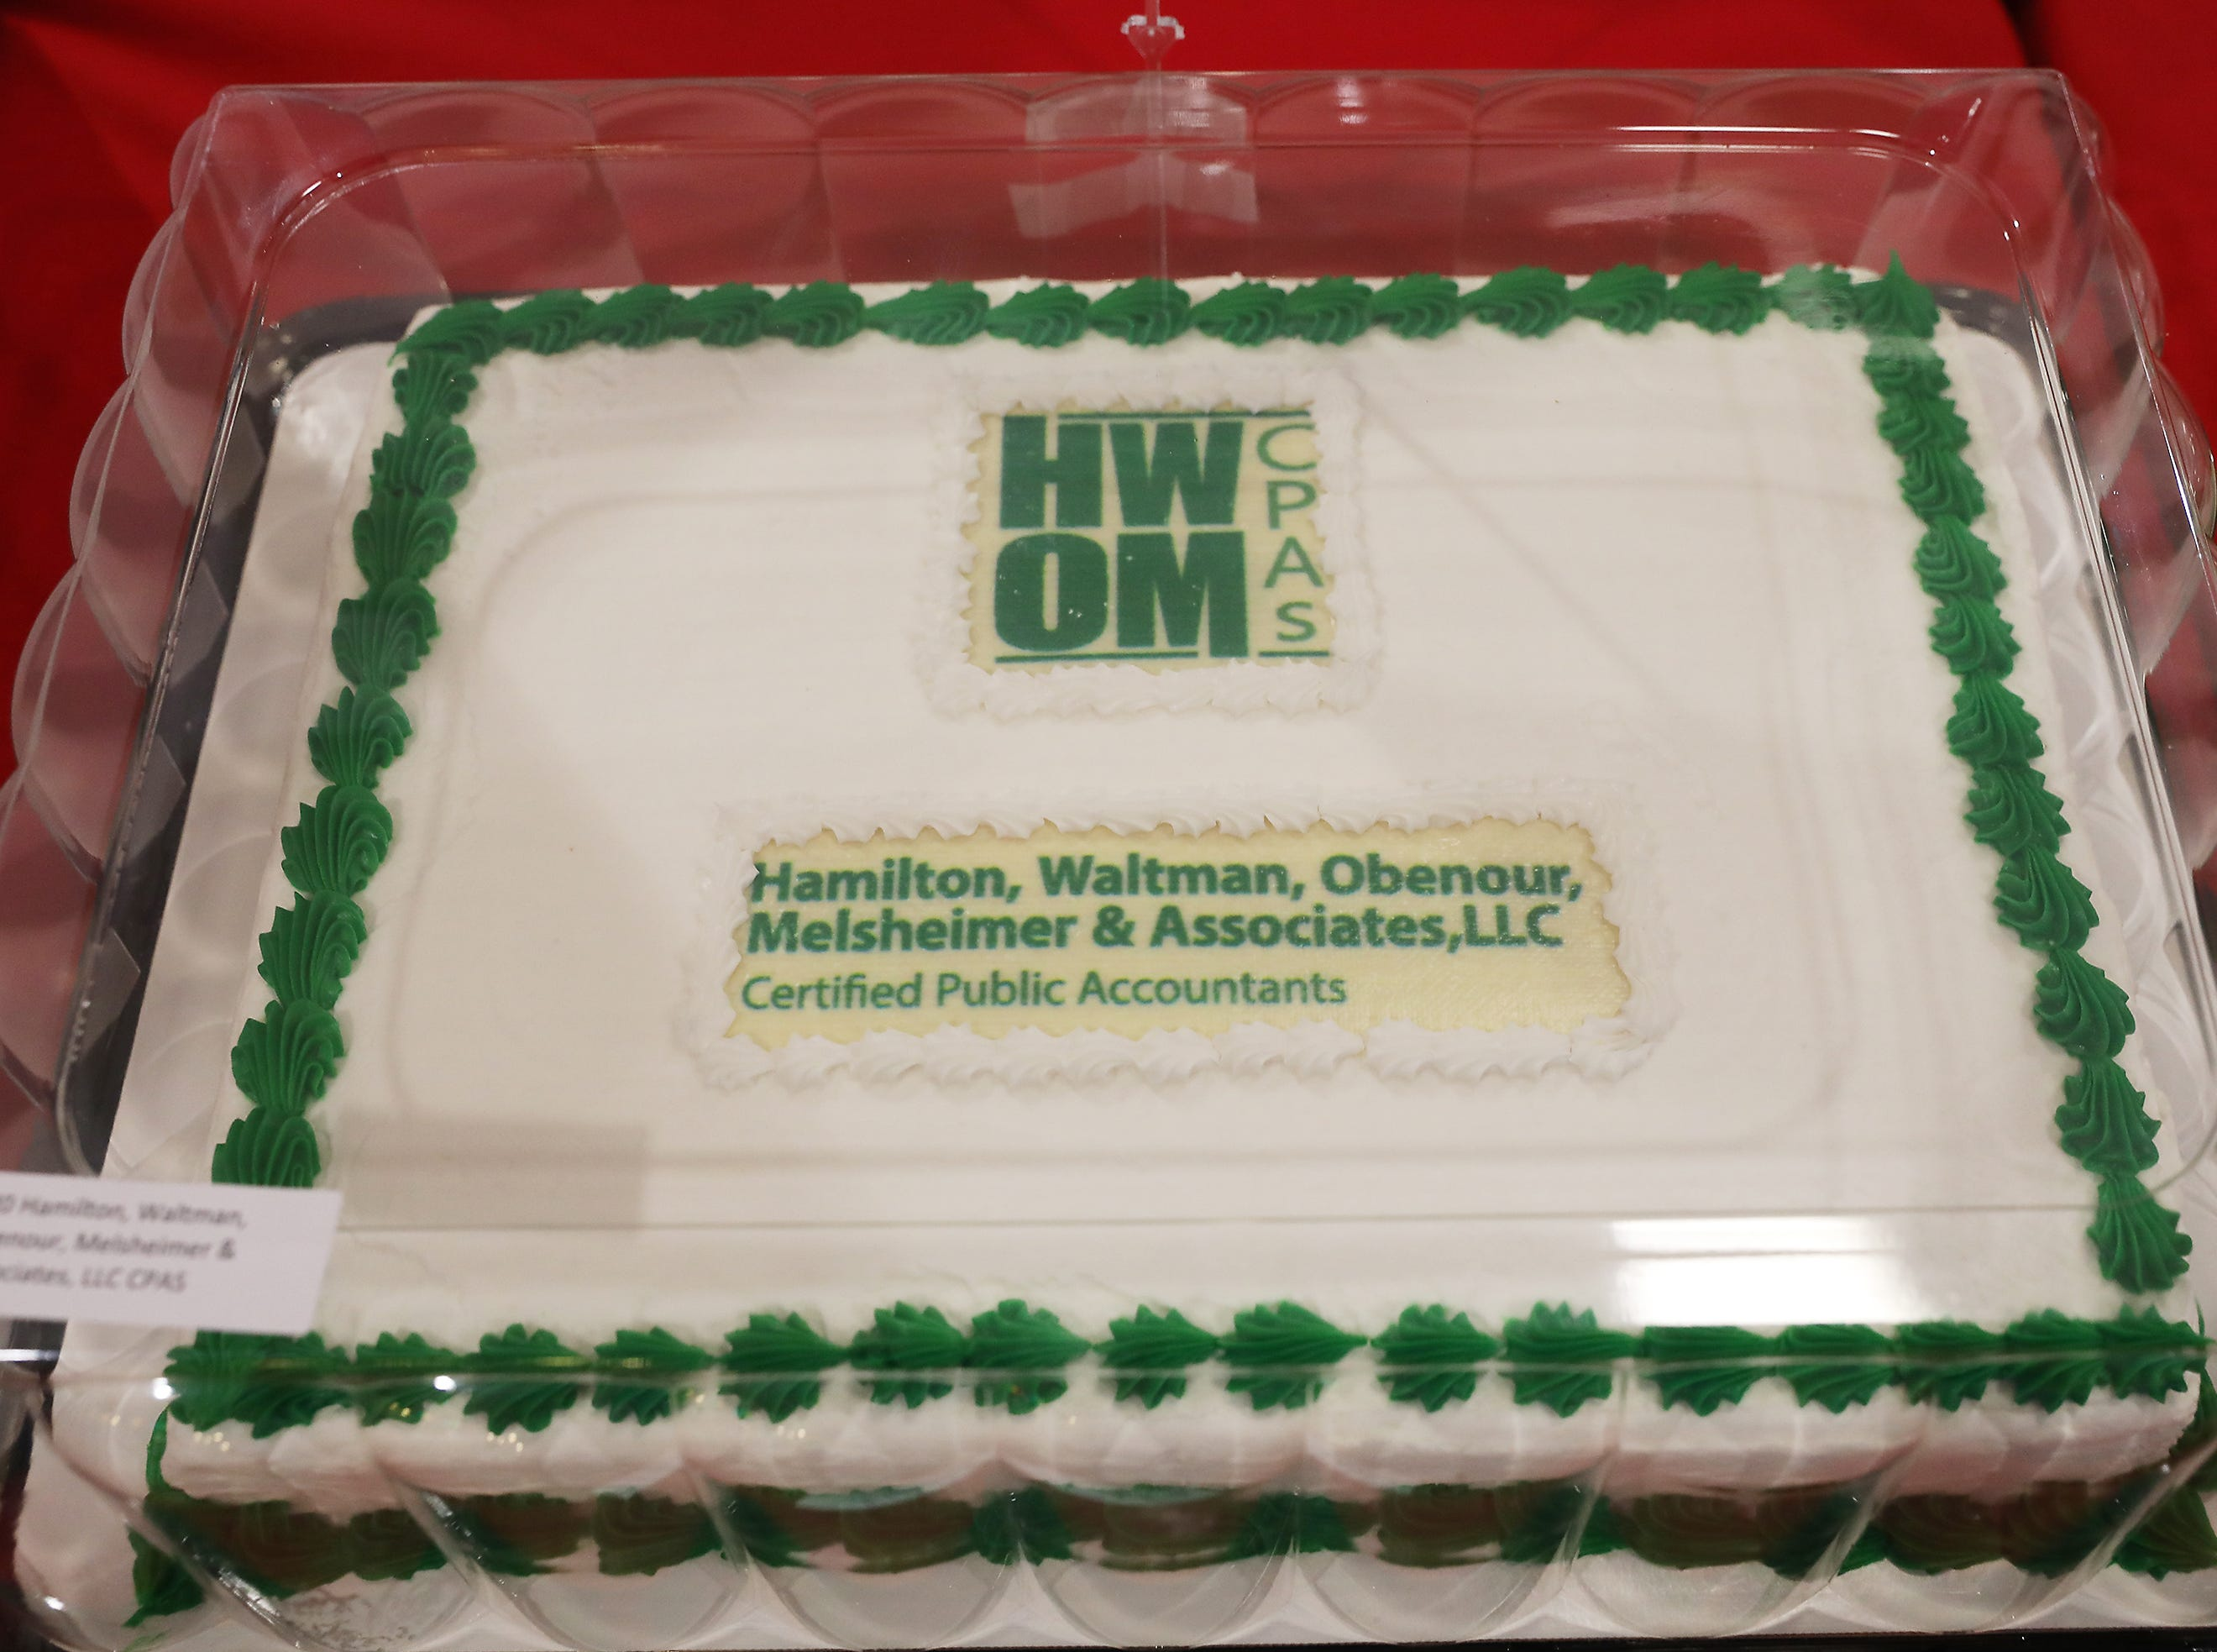 2:00 P.M. Thursday cake 120 Hamilton, Waltman, Obenour, Melsheimer & Associates - $40 gift cards to Adornetto's, Urban Comforts, Winerak, Hot Head's, Terry's Tavern & Subway